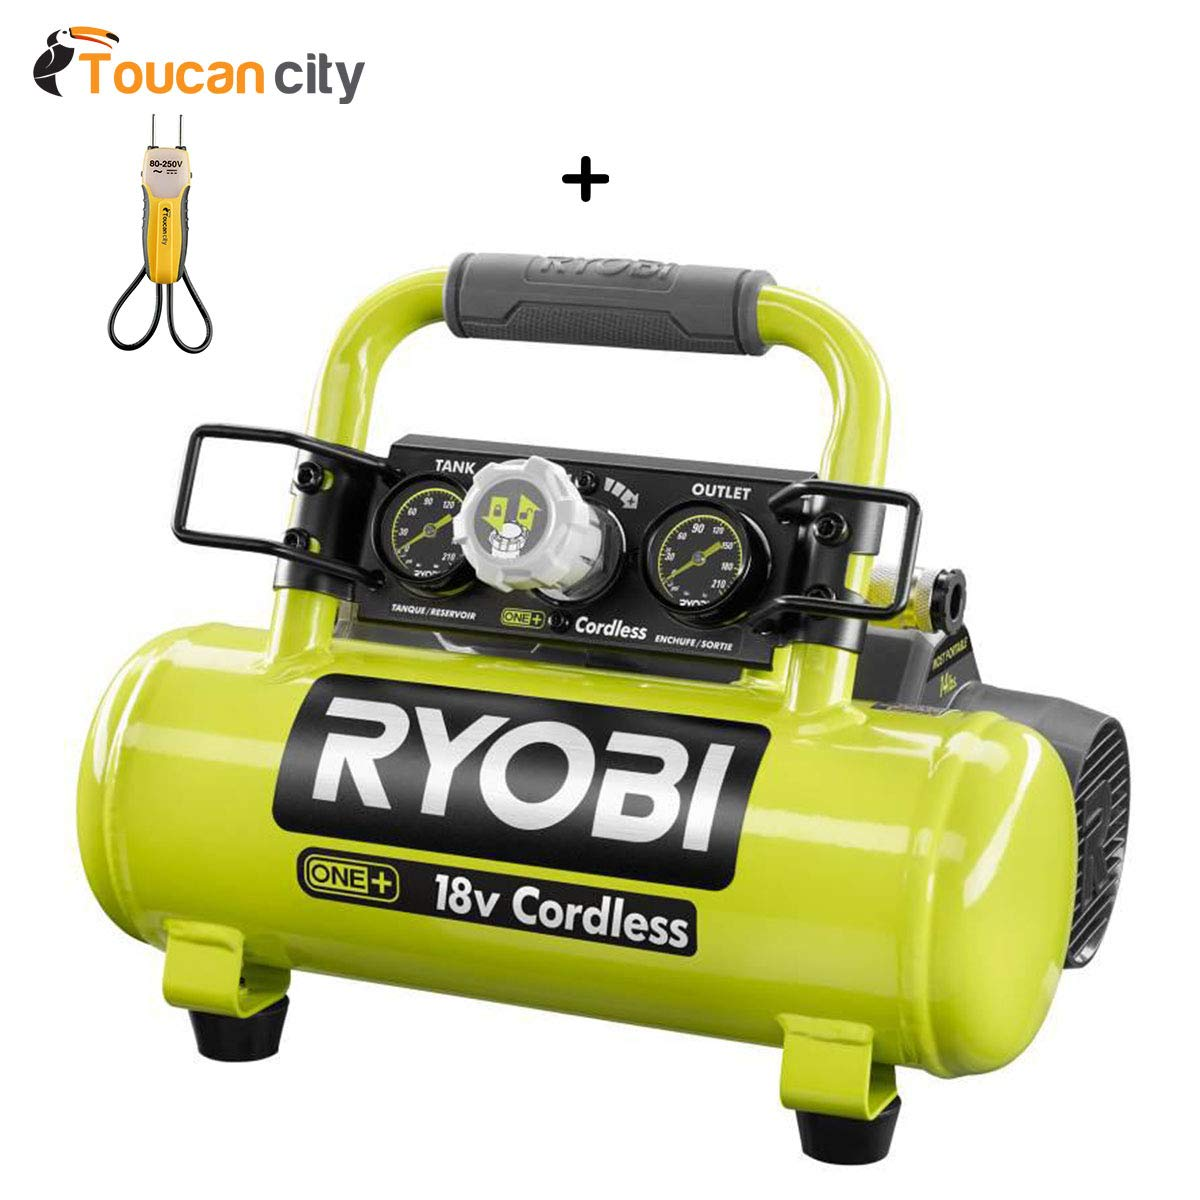 Toucan City Voltage Tester and Ryobi 18-Volt ONE+ Cordless 1 Gal. Portable Air Compressor (Tool Only) P739 Toucan City + Ryobi